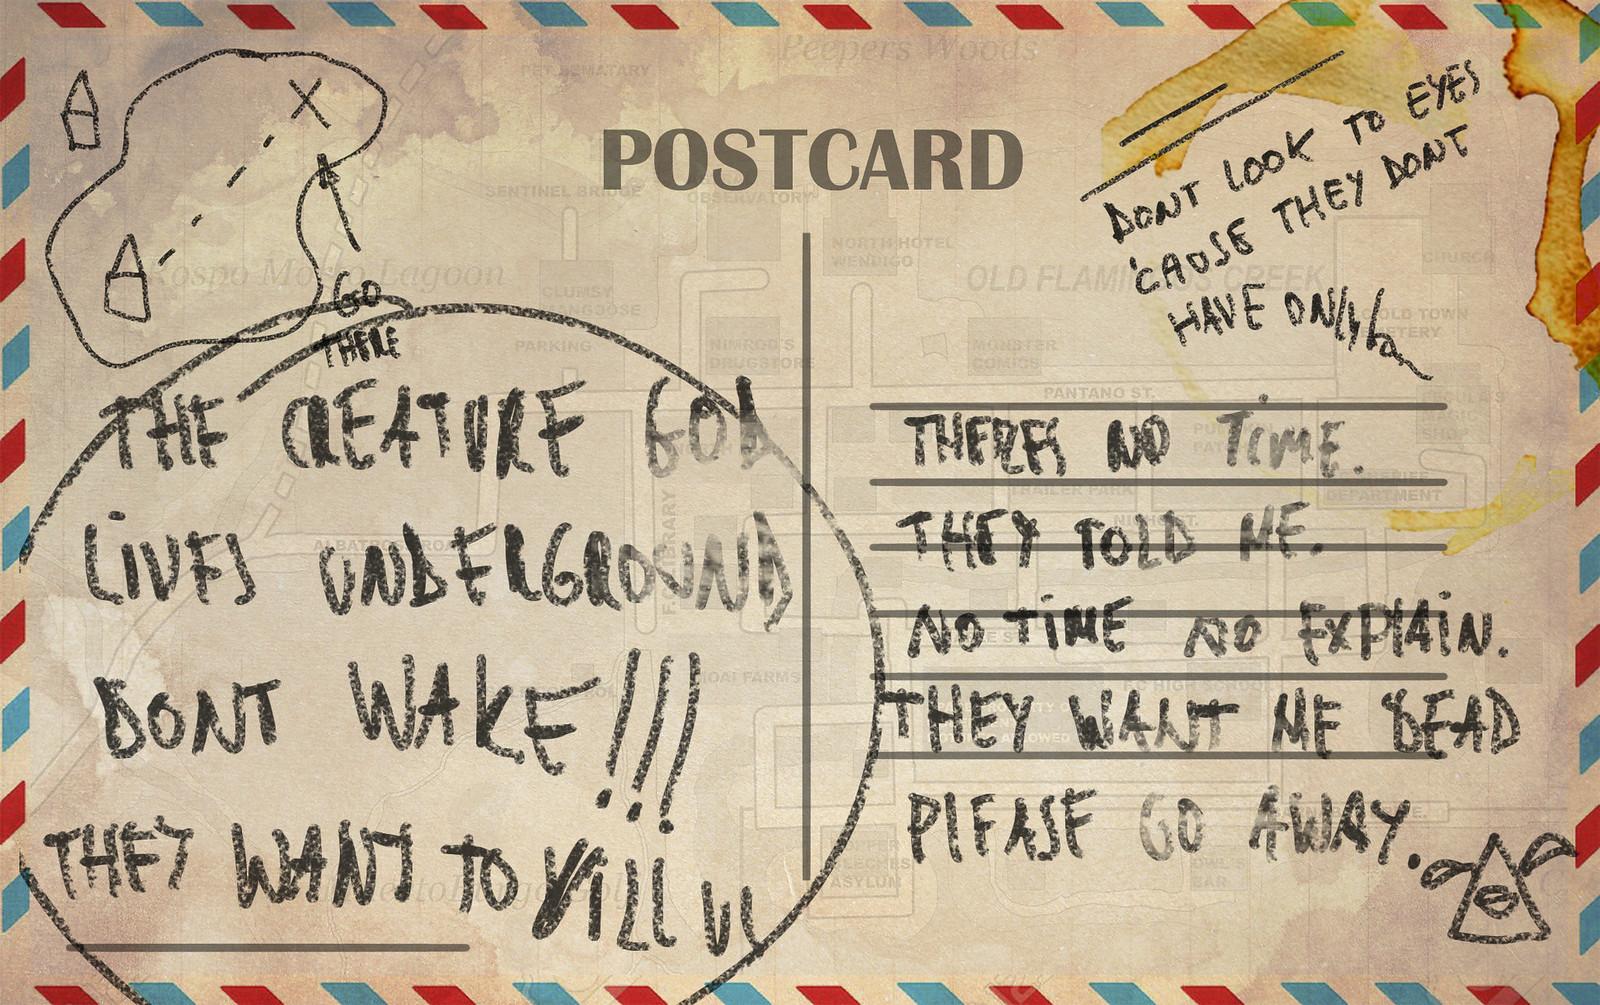 50977884286 5be2ec22c9 h - Baobabs Mausoleum Grindhouse Edition – Nostalgie trifft Mystery